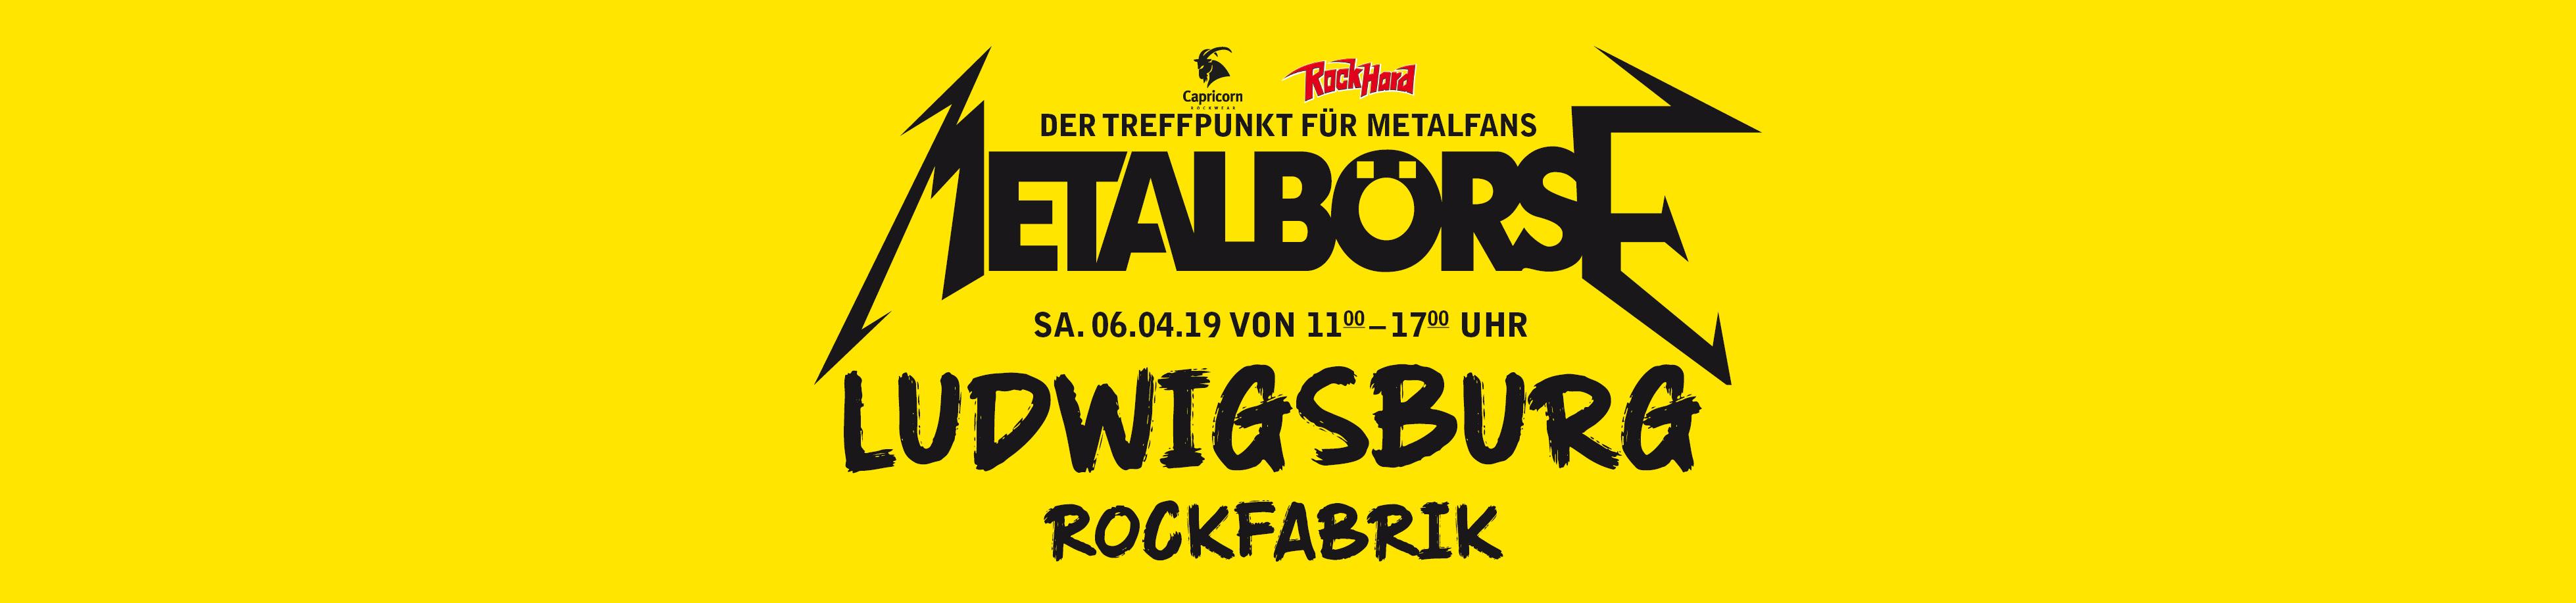 Metalbörse Ludwigsburg